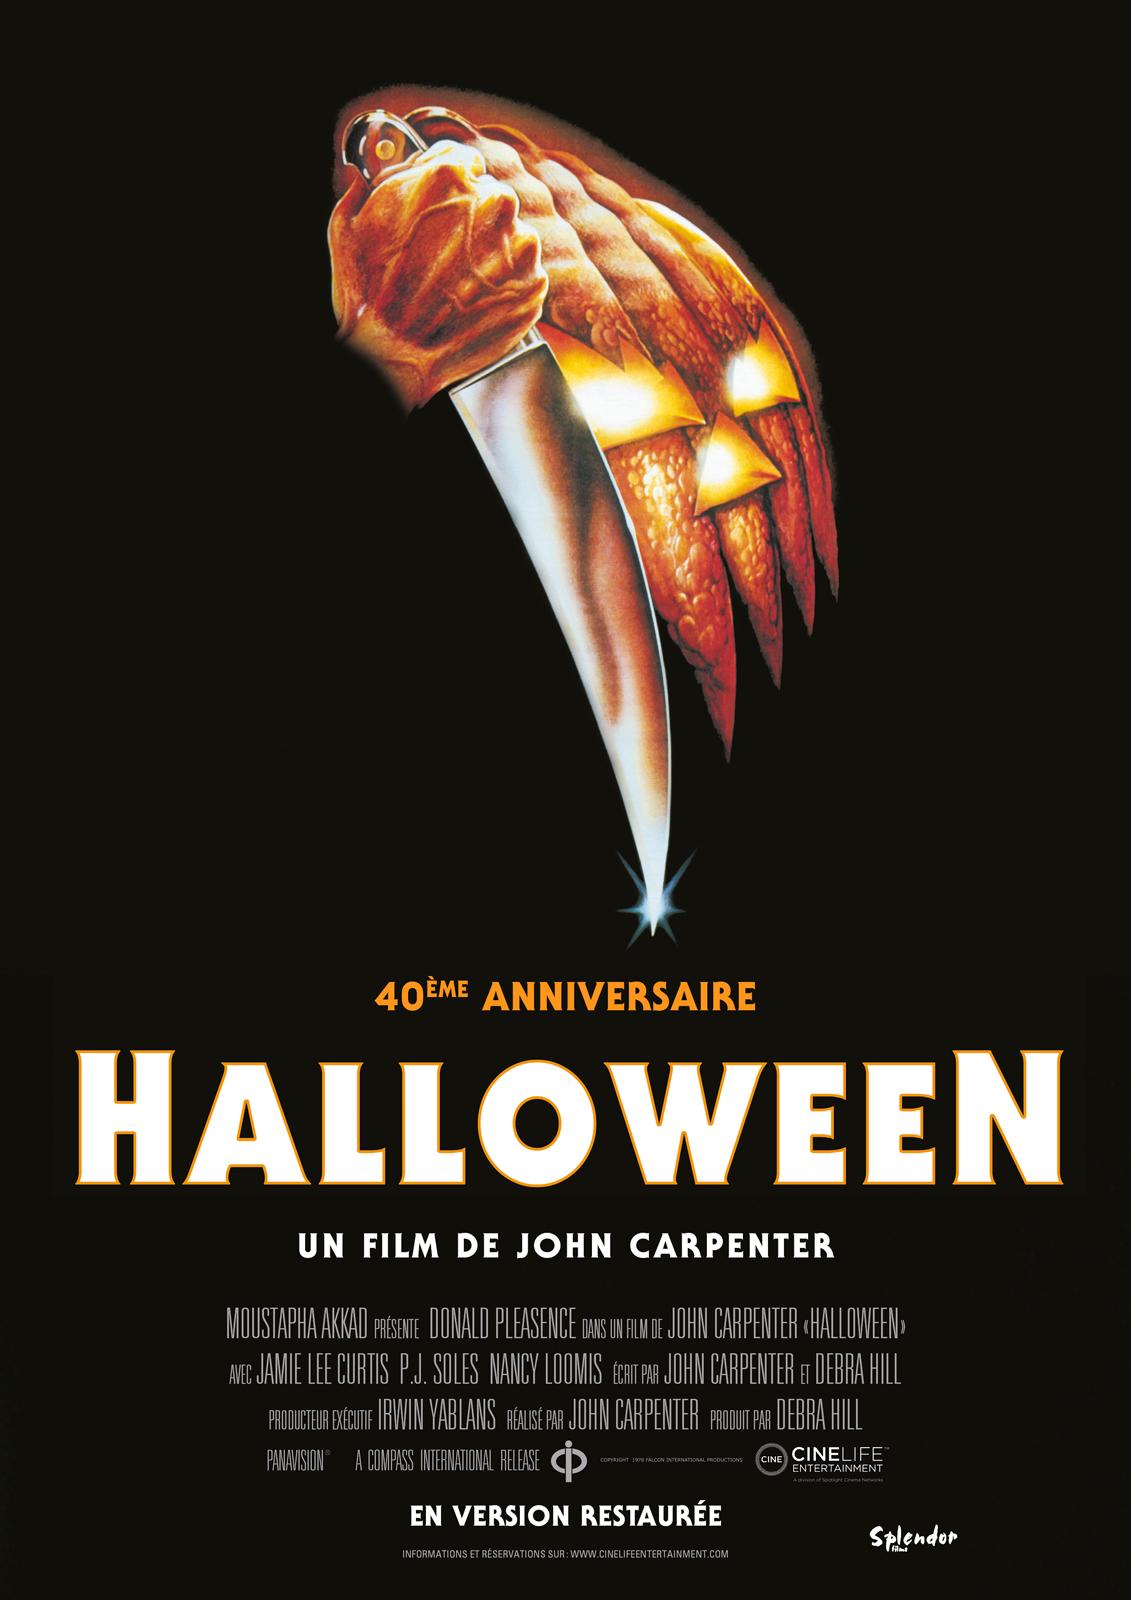 Halloween : La Nuit Des Masques : halloween, masques, Achat, Halloween,, Masques, AlloCiné